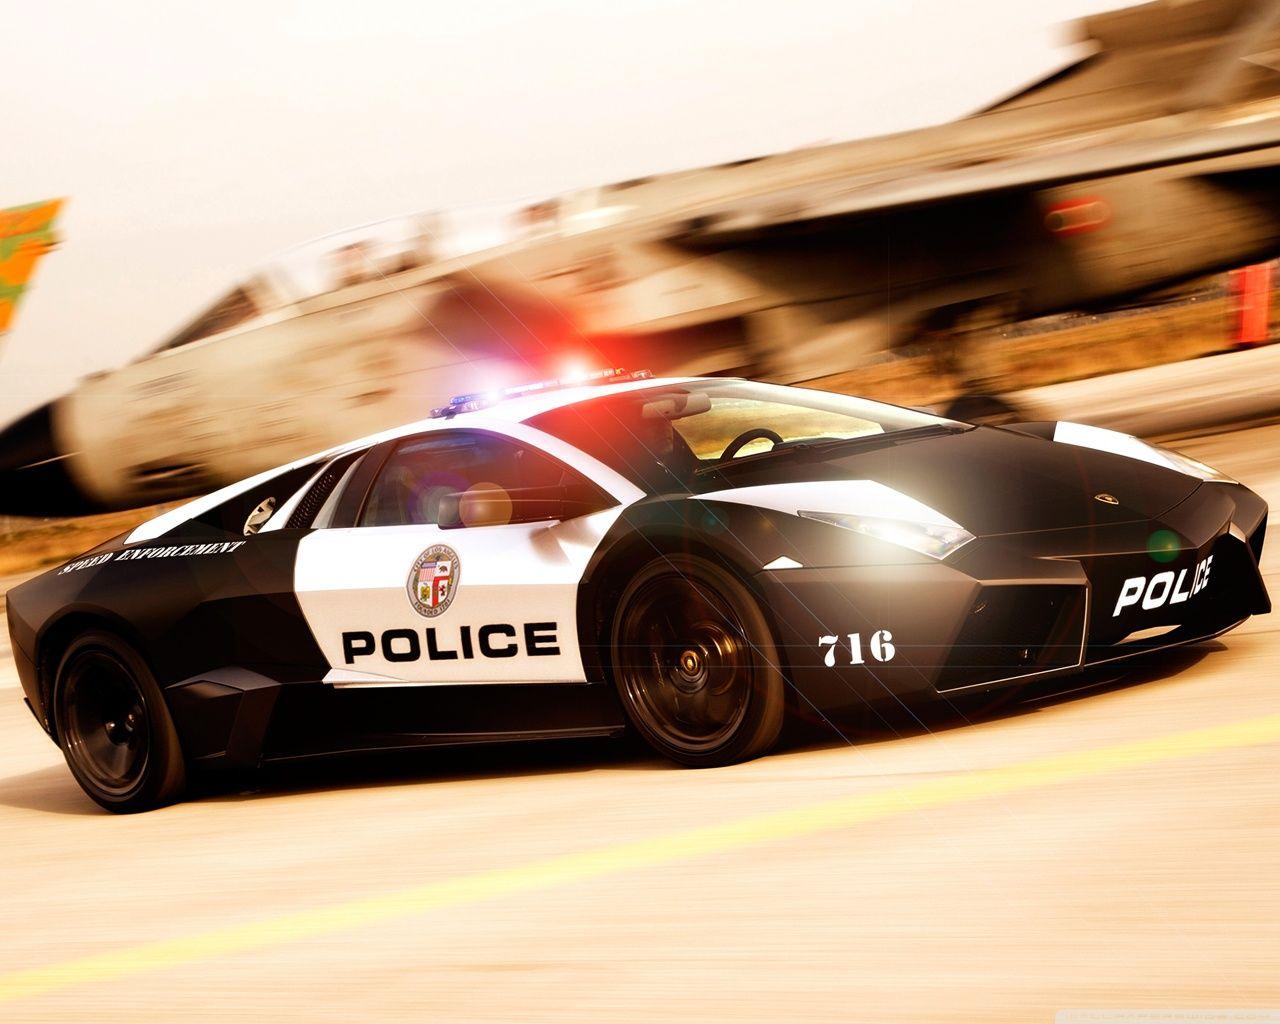 Police Car Lamborghini Police Cars Police Lamborghini Police